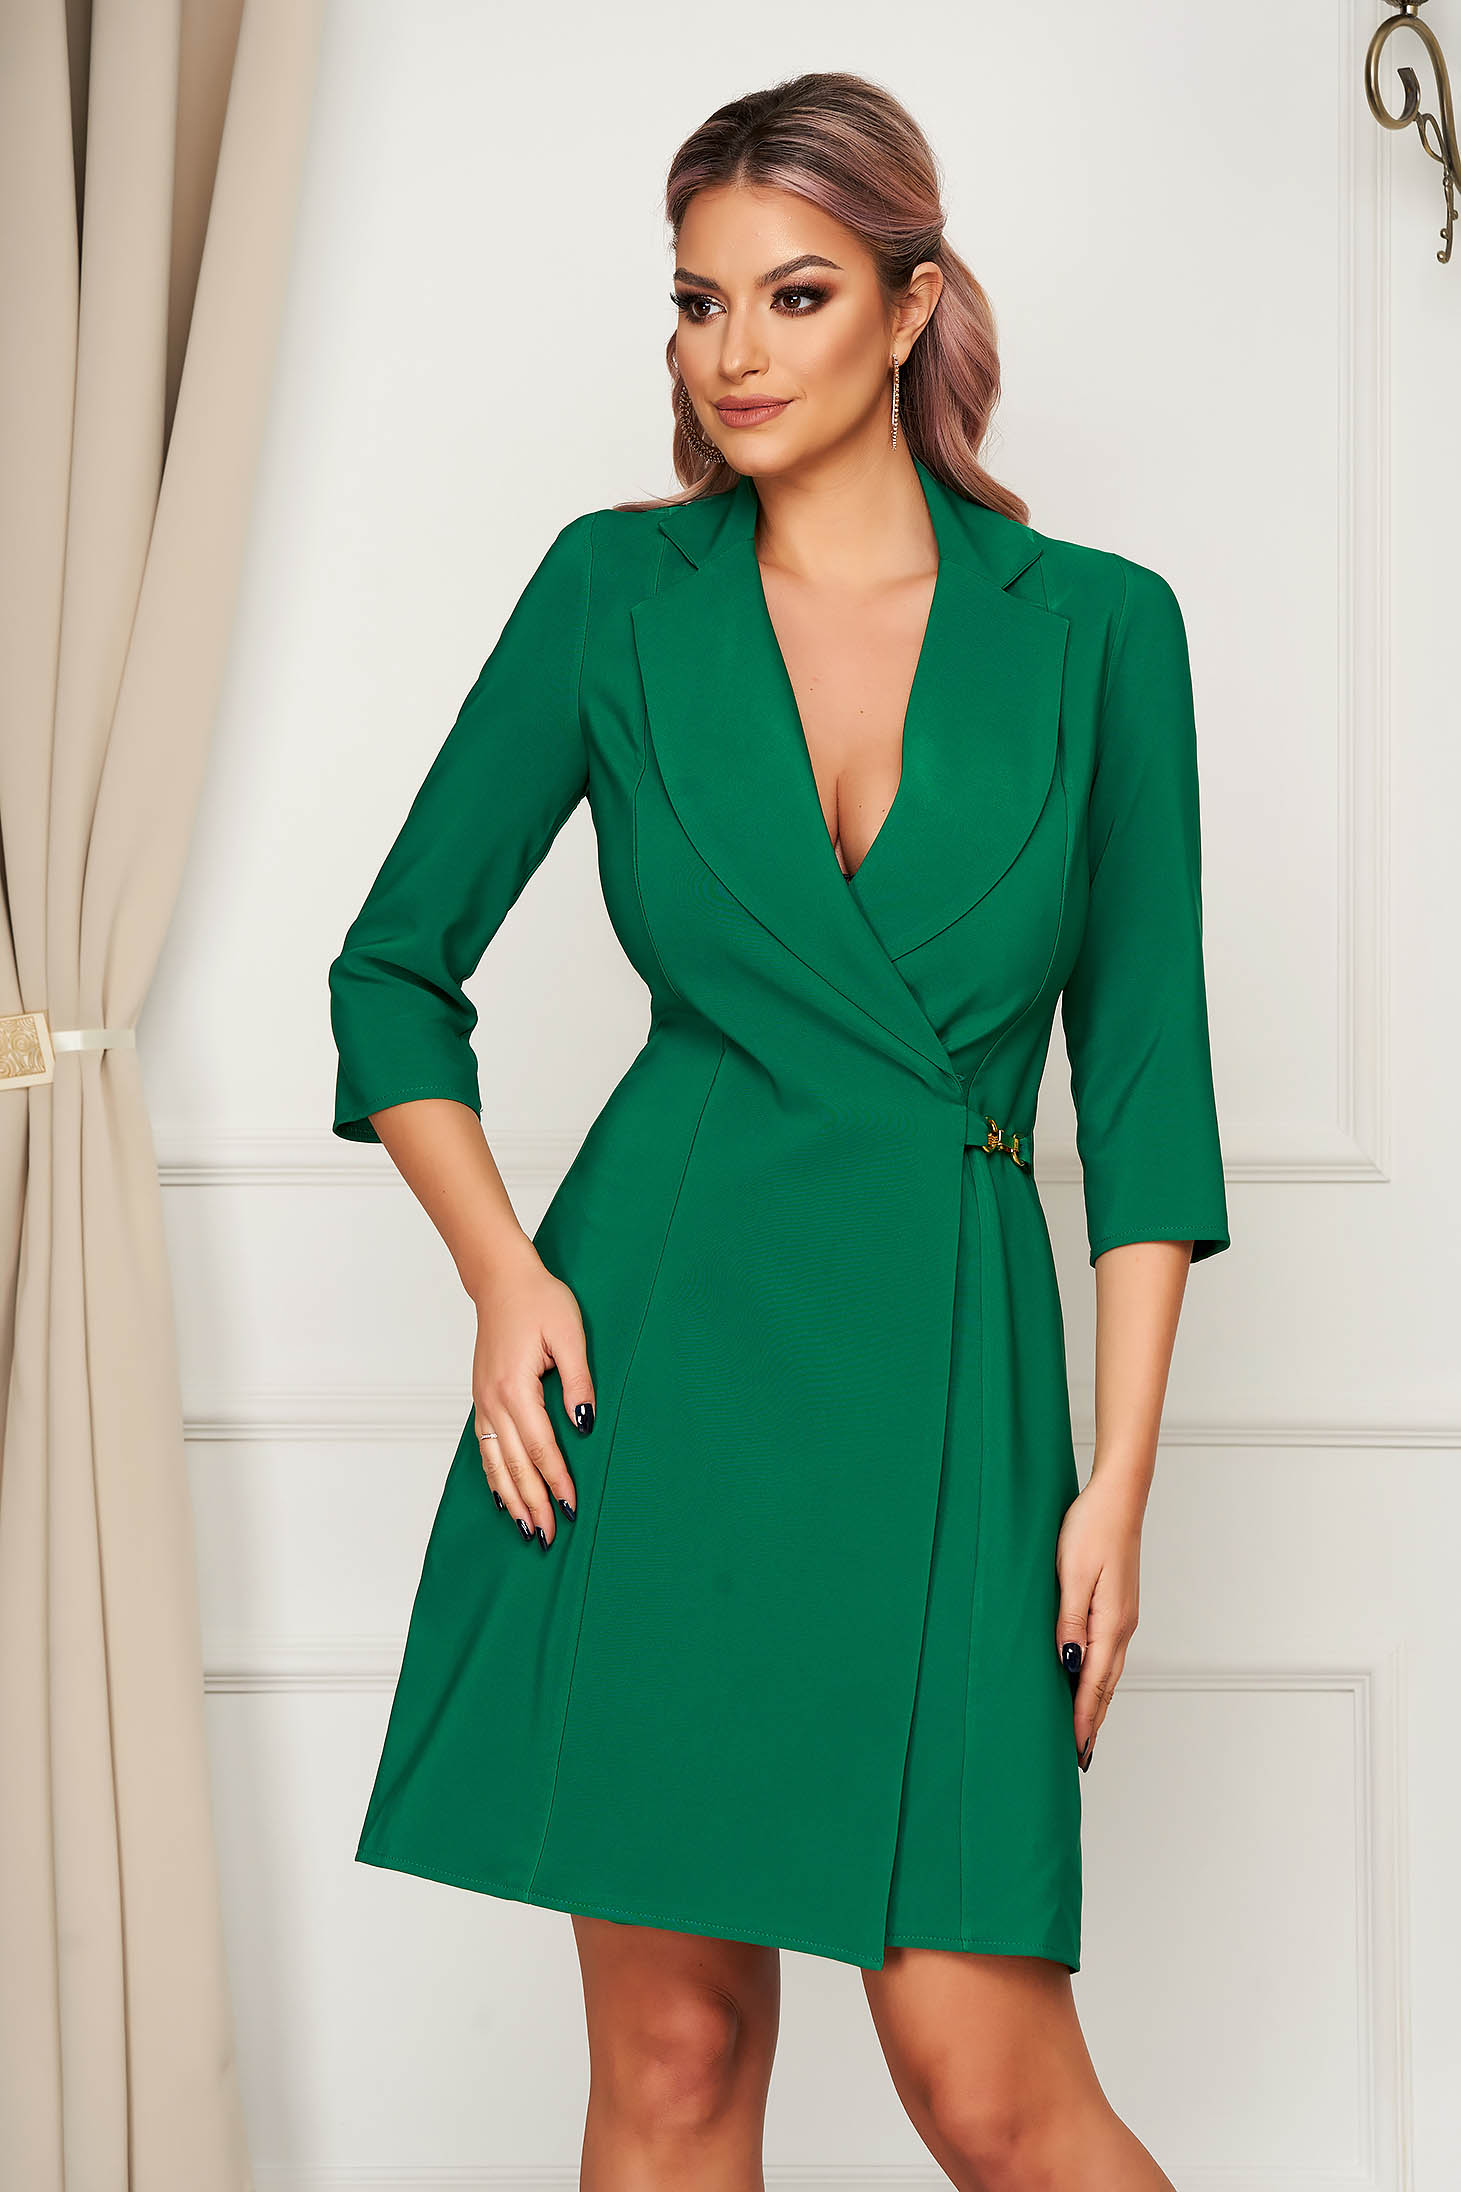 Elegant short cut pencil green dress wrap around cloth thin fabric